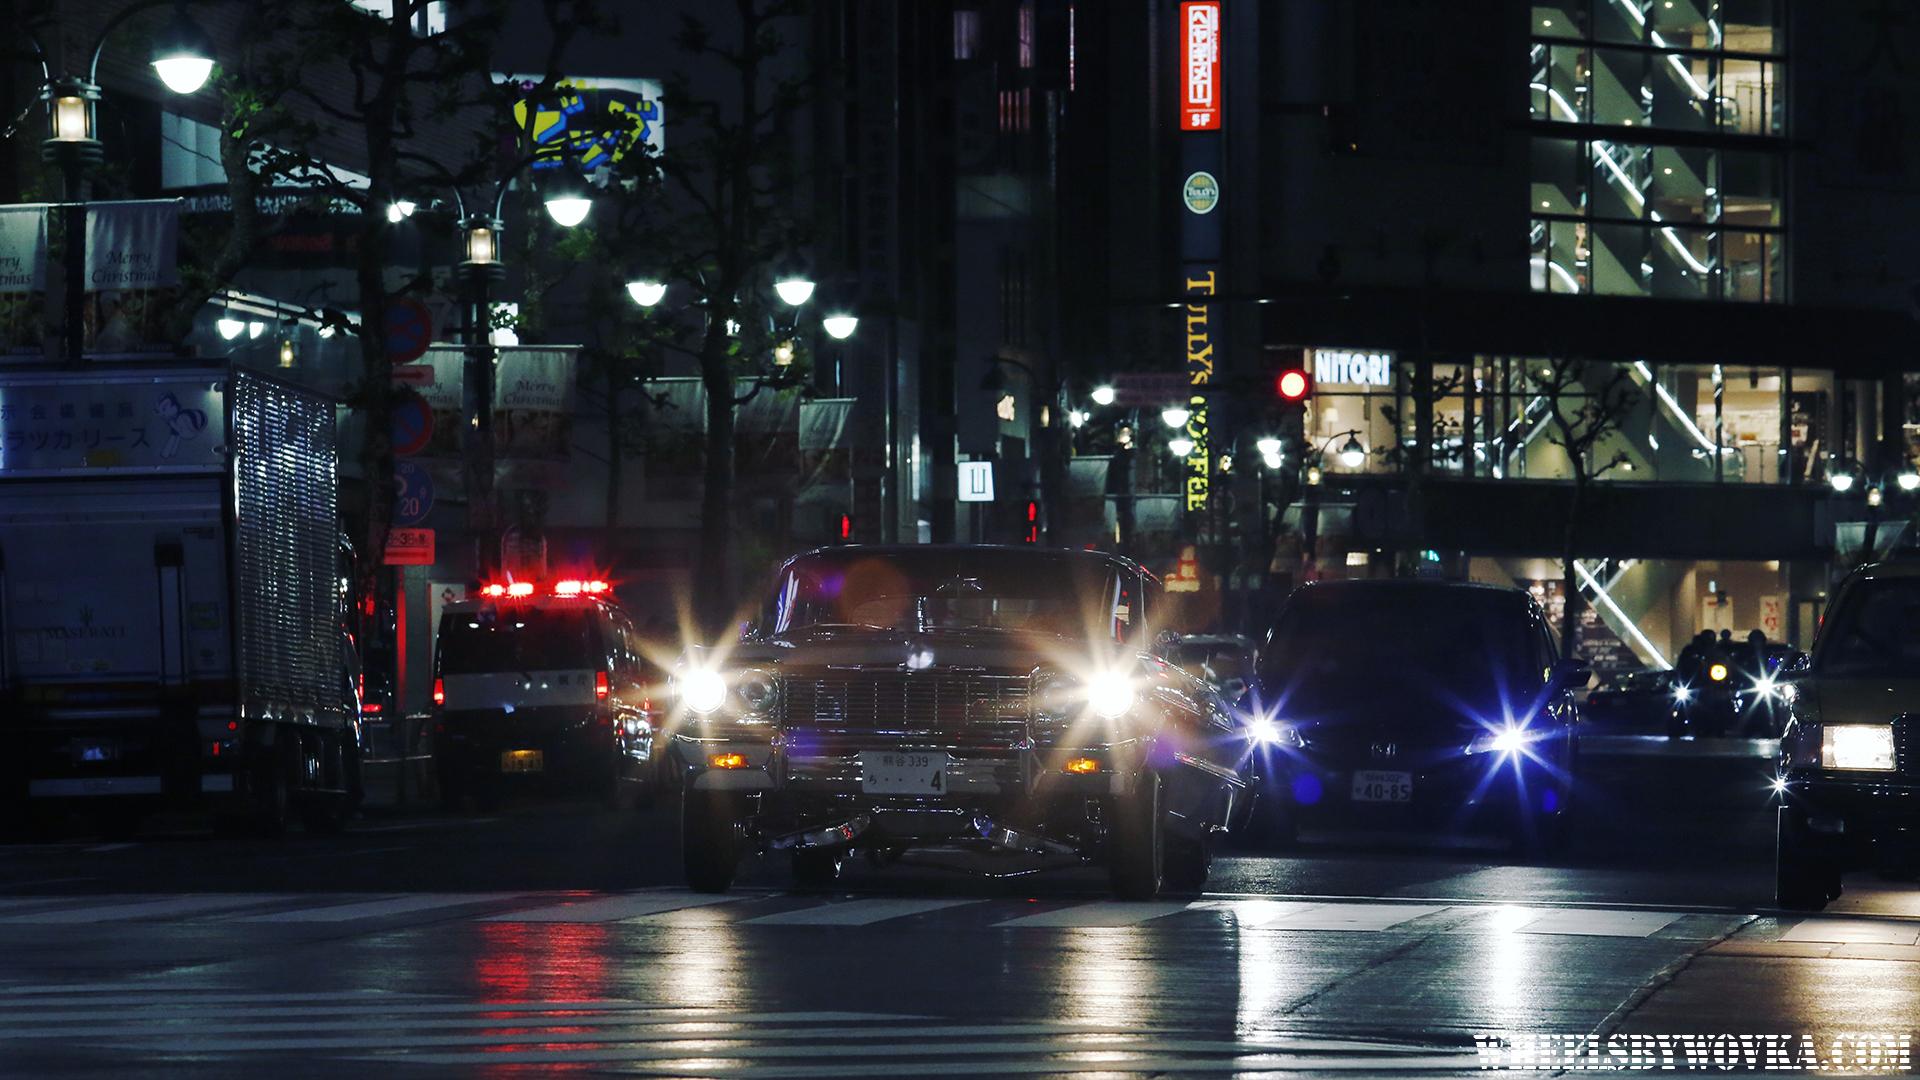 shibuya-japan-tokyo-lowrider-cruise-night-8